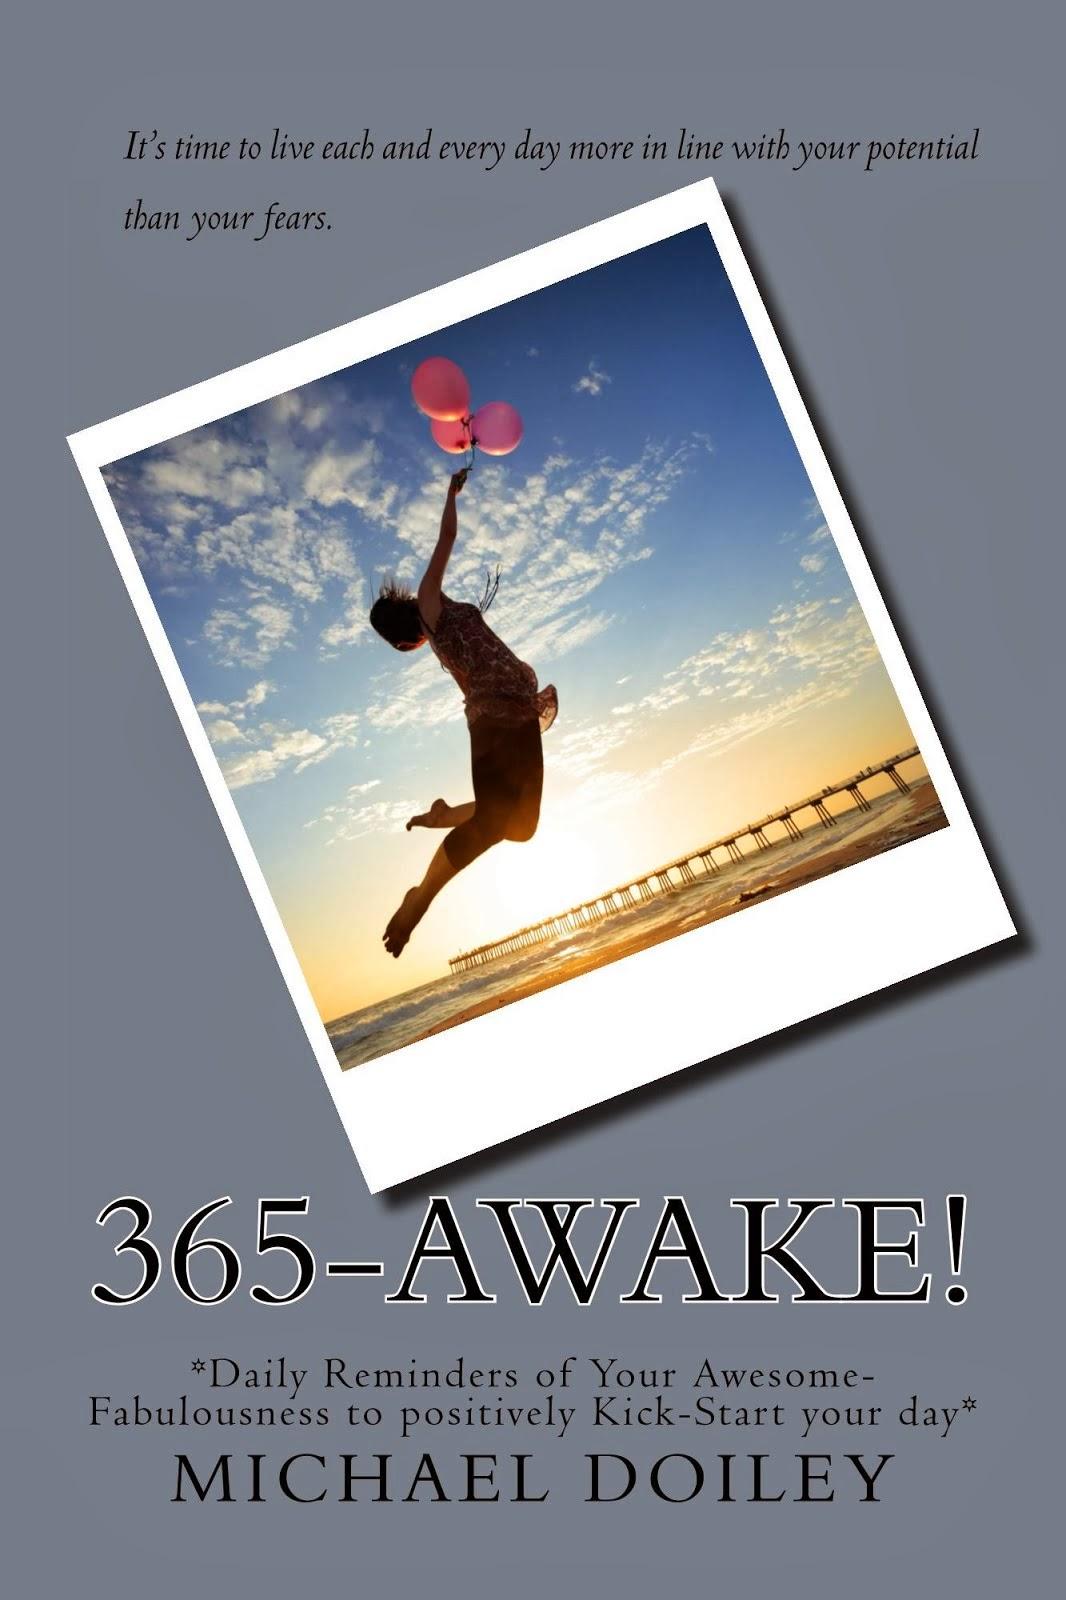 365-Awake!